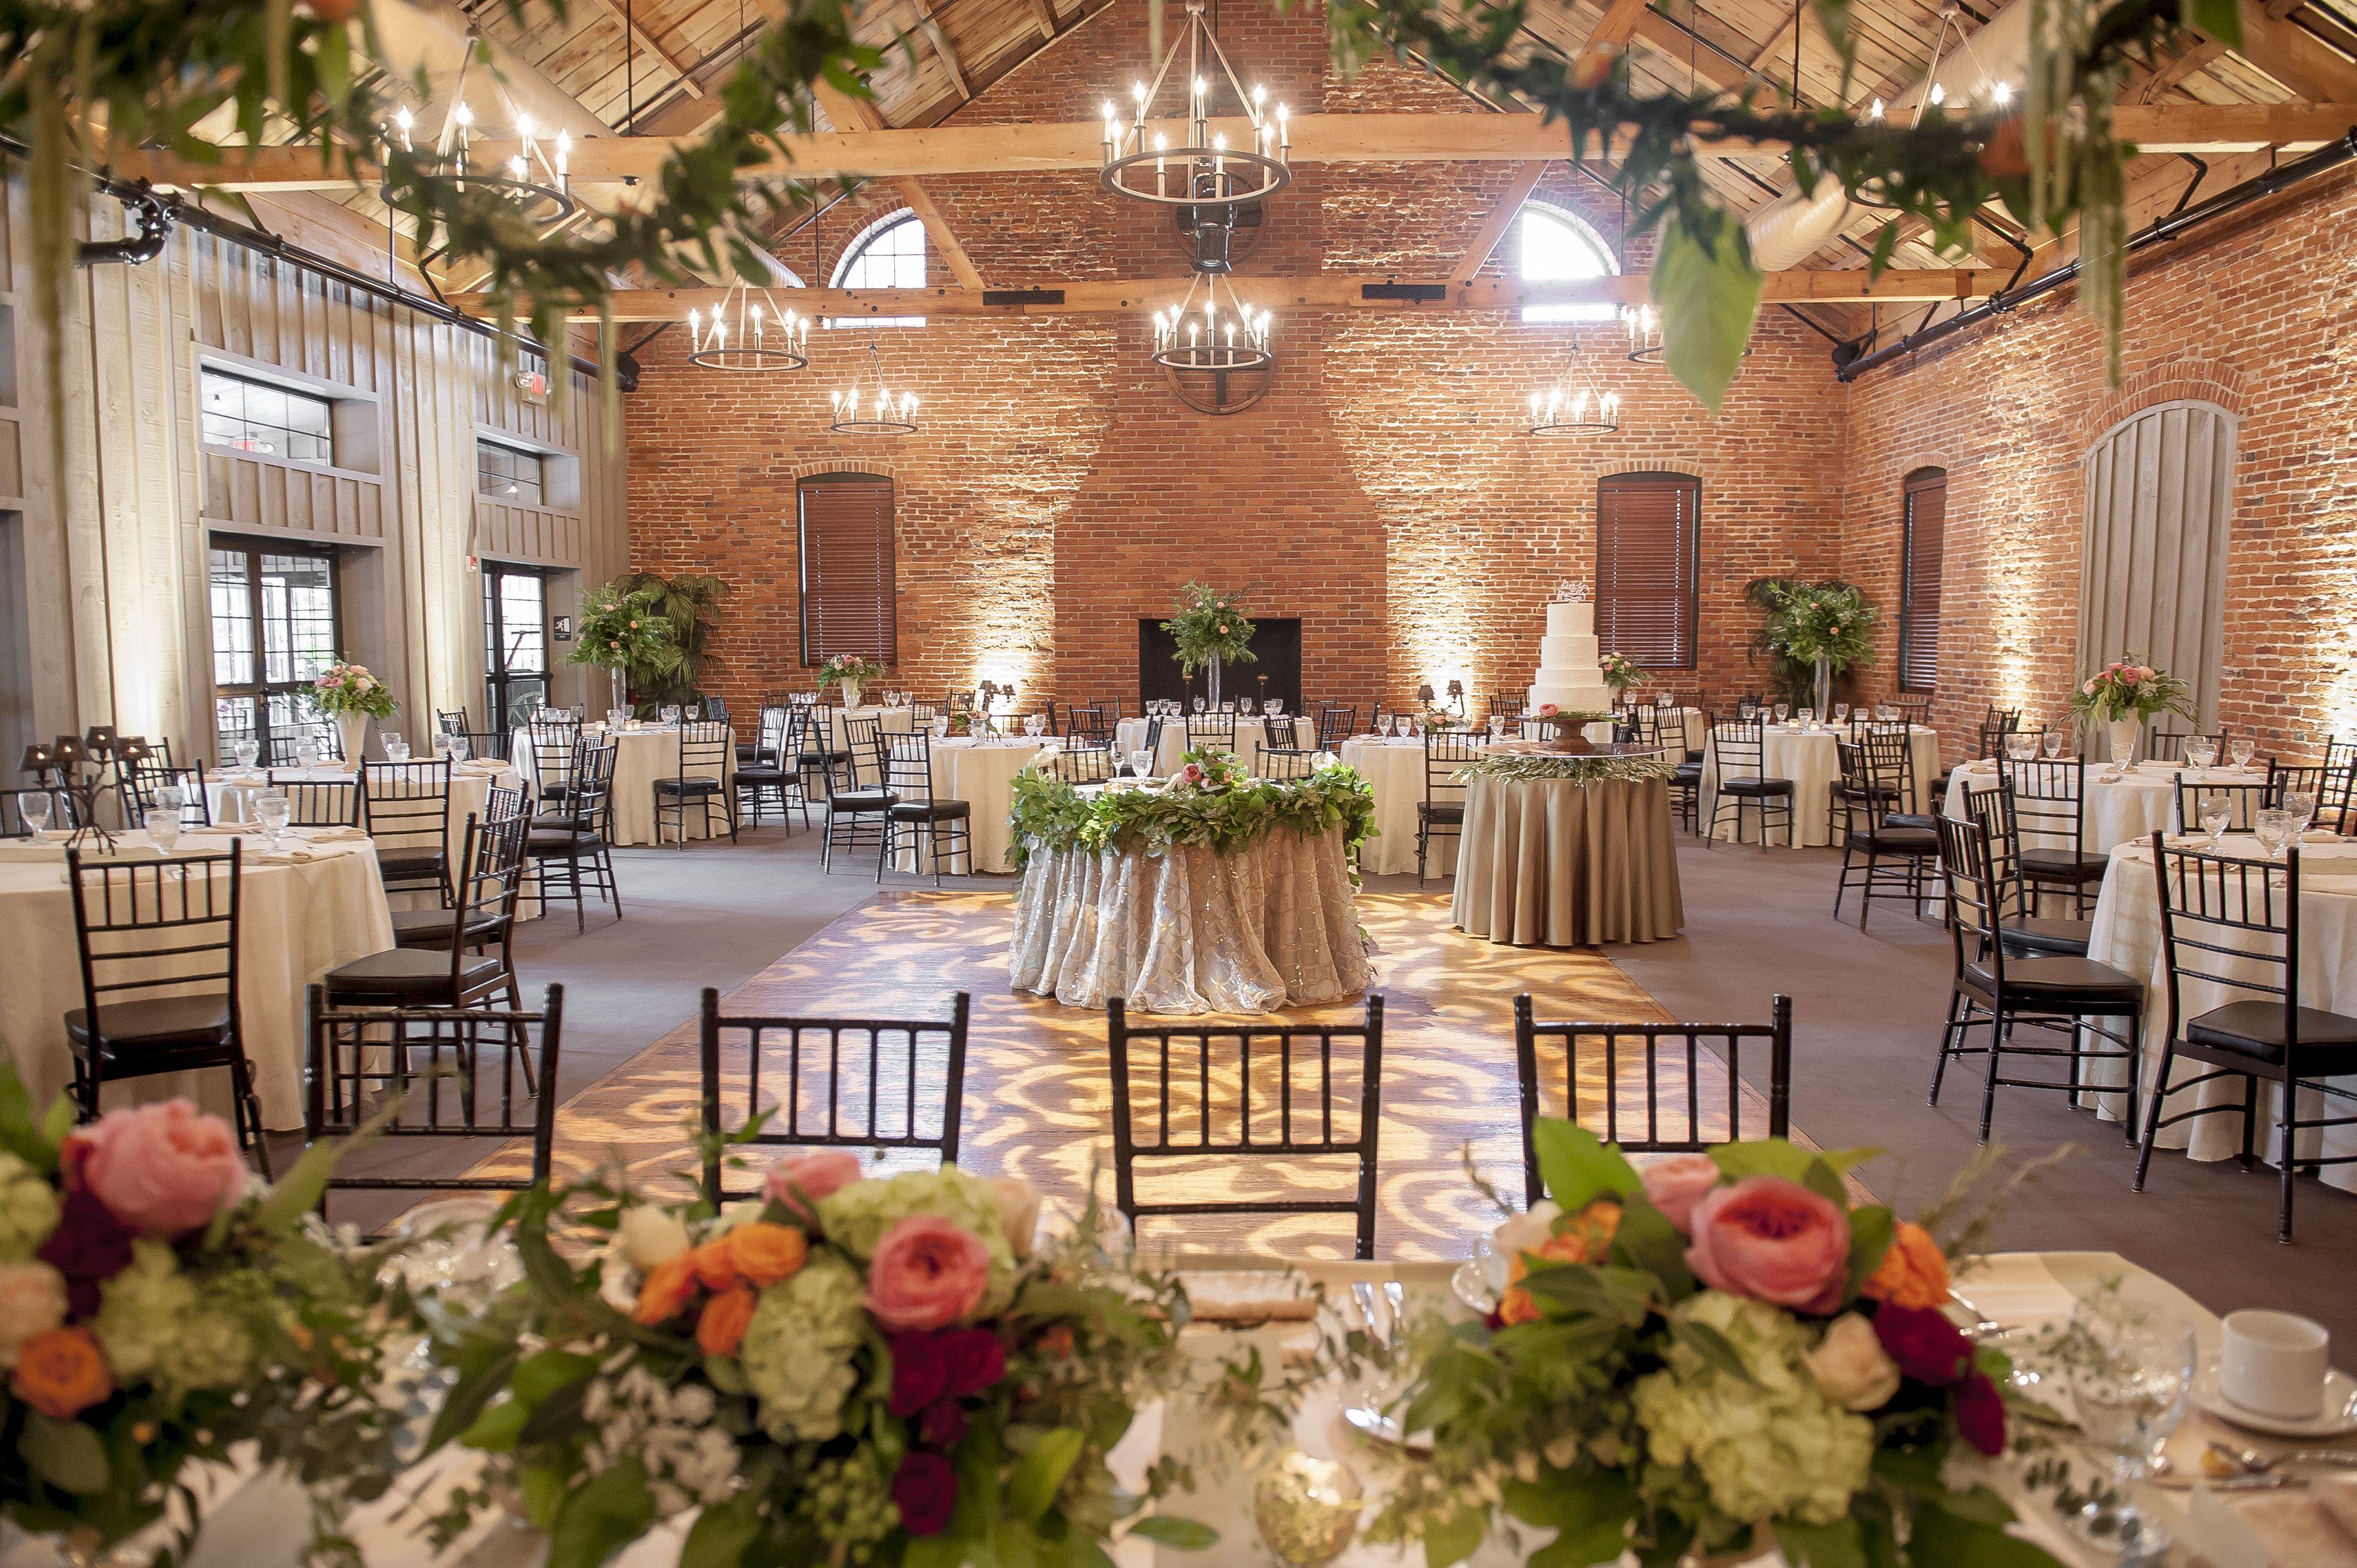 Wedding Venues In Lancaster Pa Wedding Venues Pennsylvania Philadelphia Wedding Venues Bridal Shower Venues